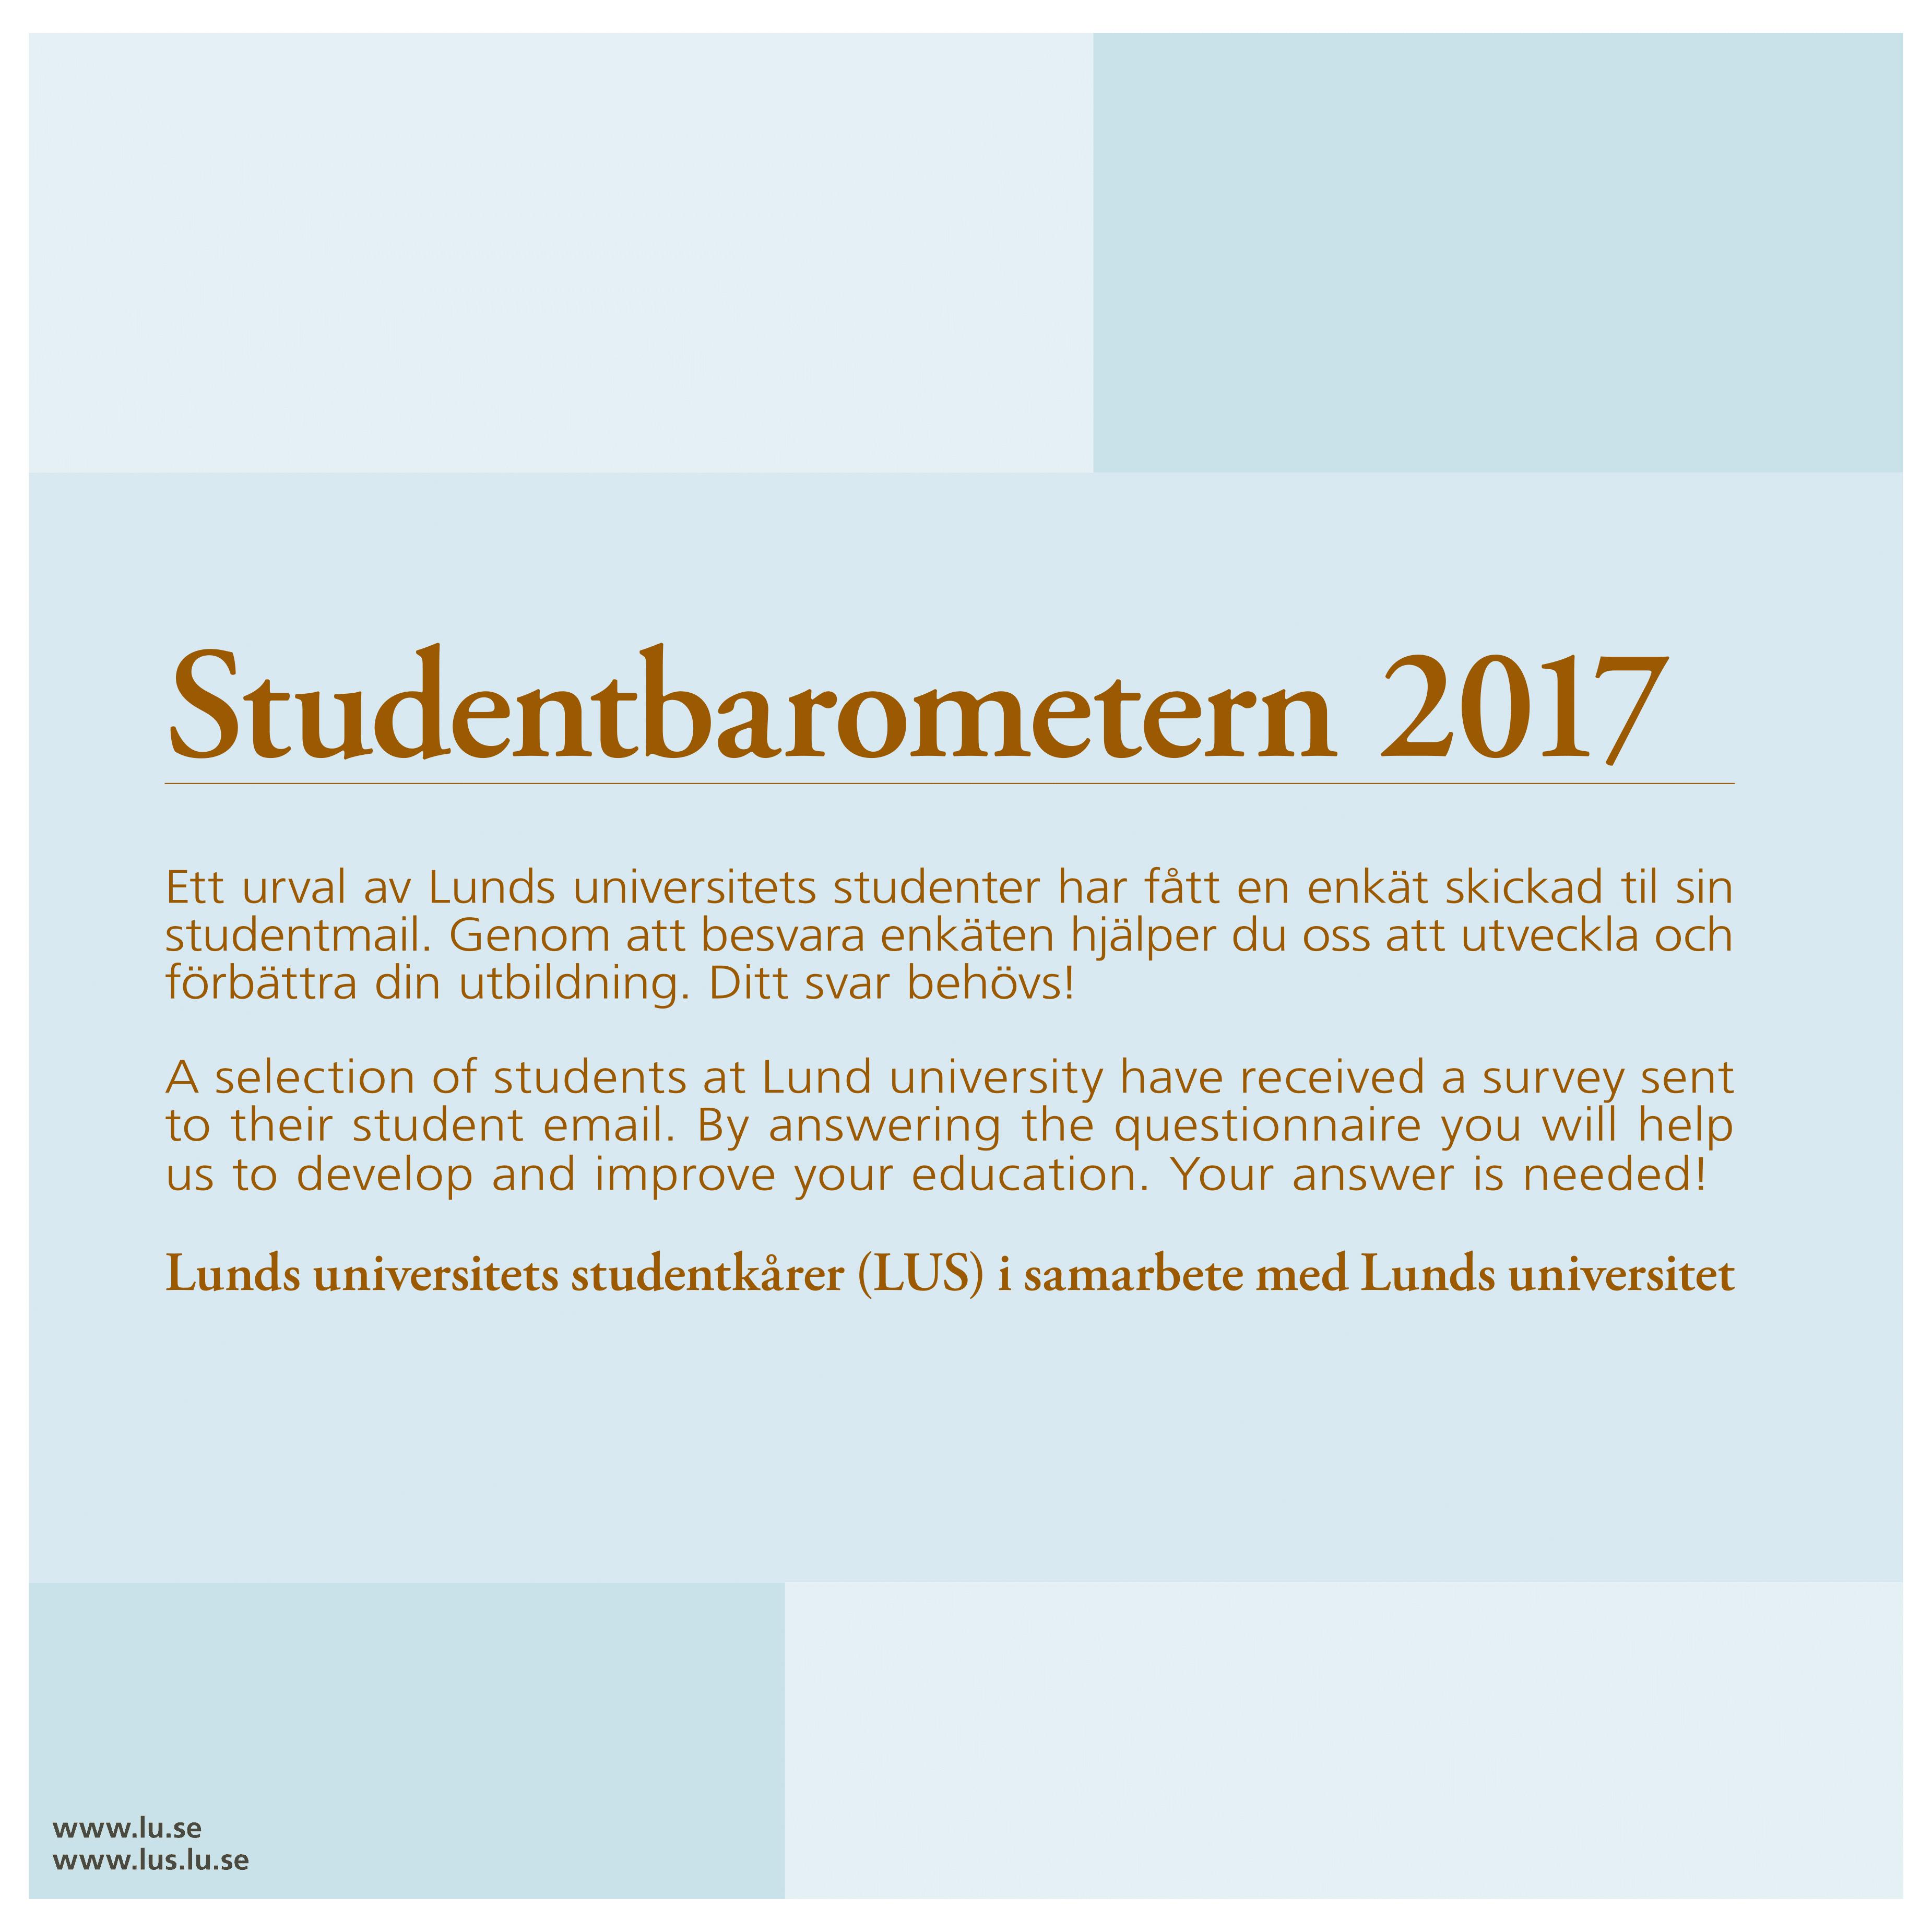 Studentbarometern 2017